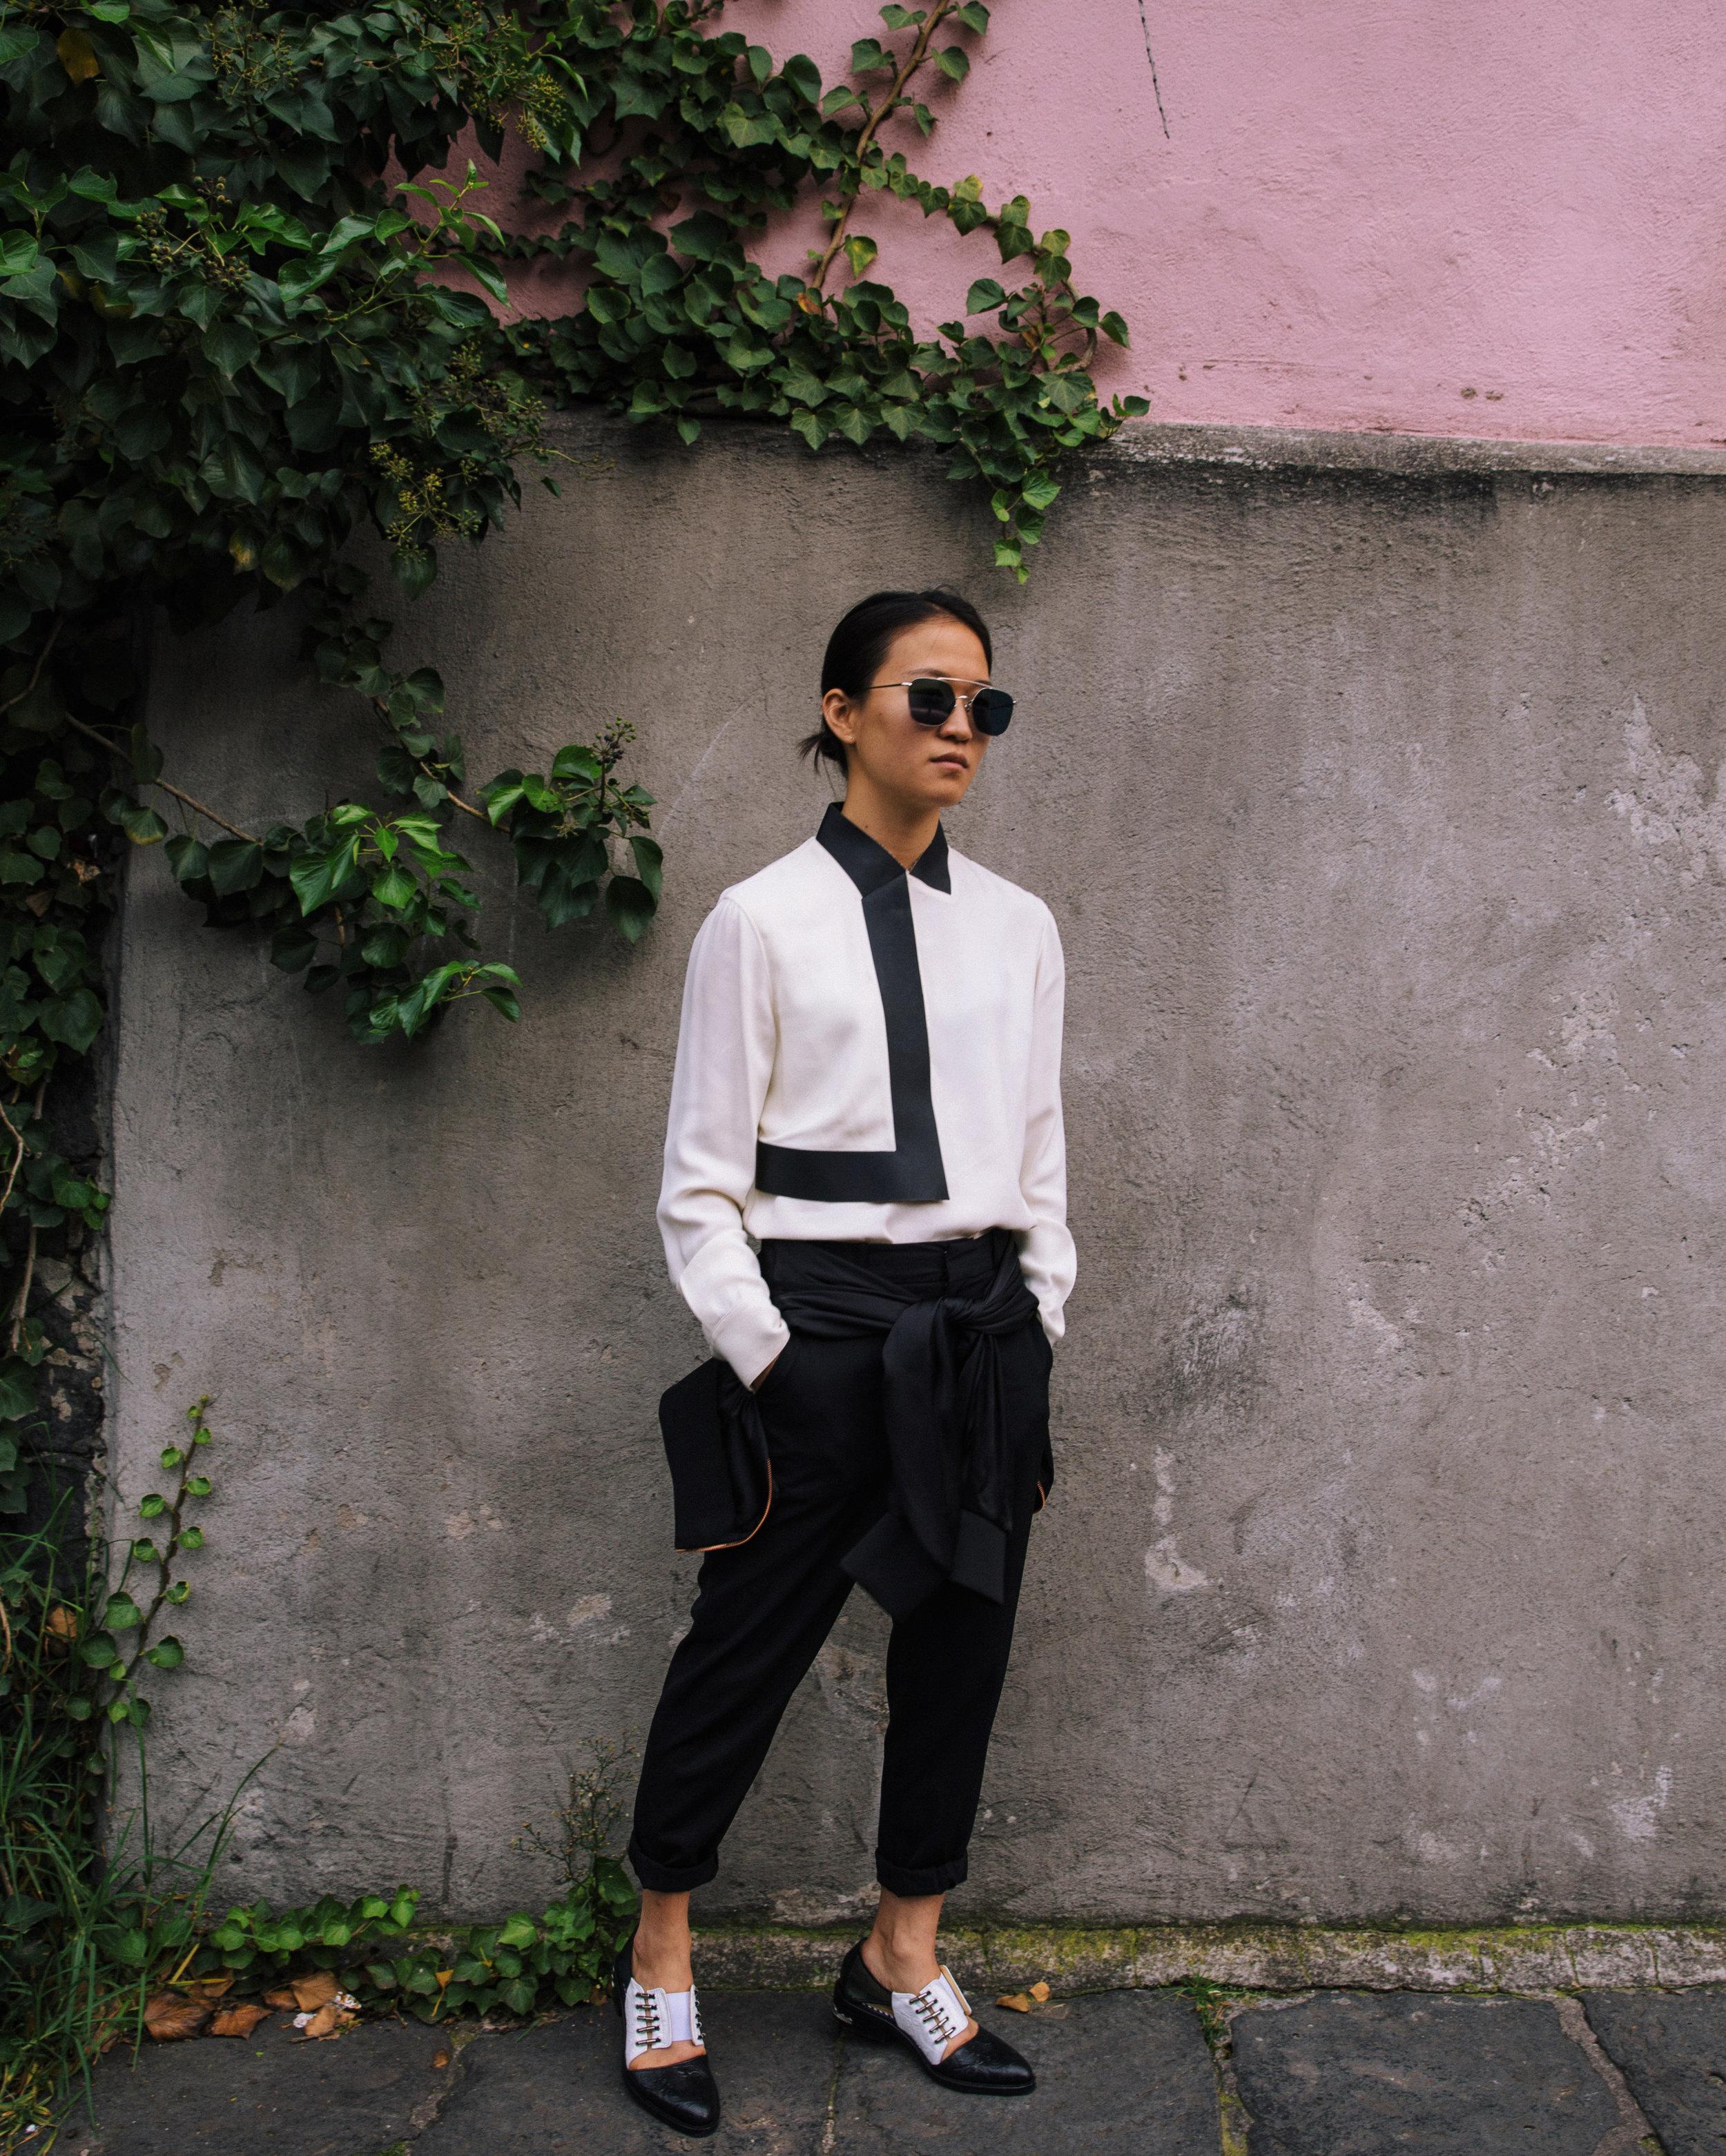 alexander wang blouse, steven alan trousers, zara cropped satin jacket (on waist), toga cut out shoes, ahlem sunglasses  photo by  Daniel Han